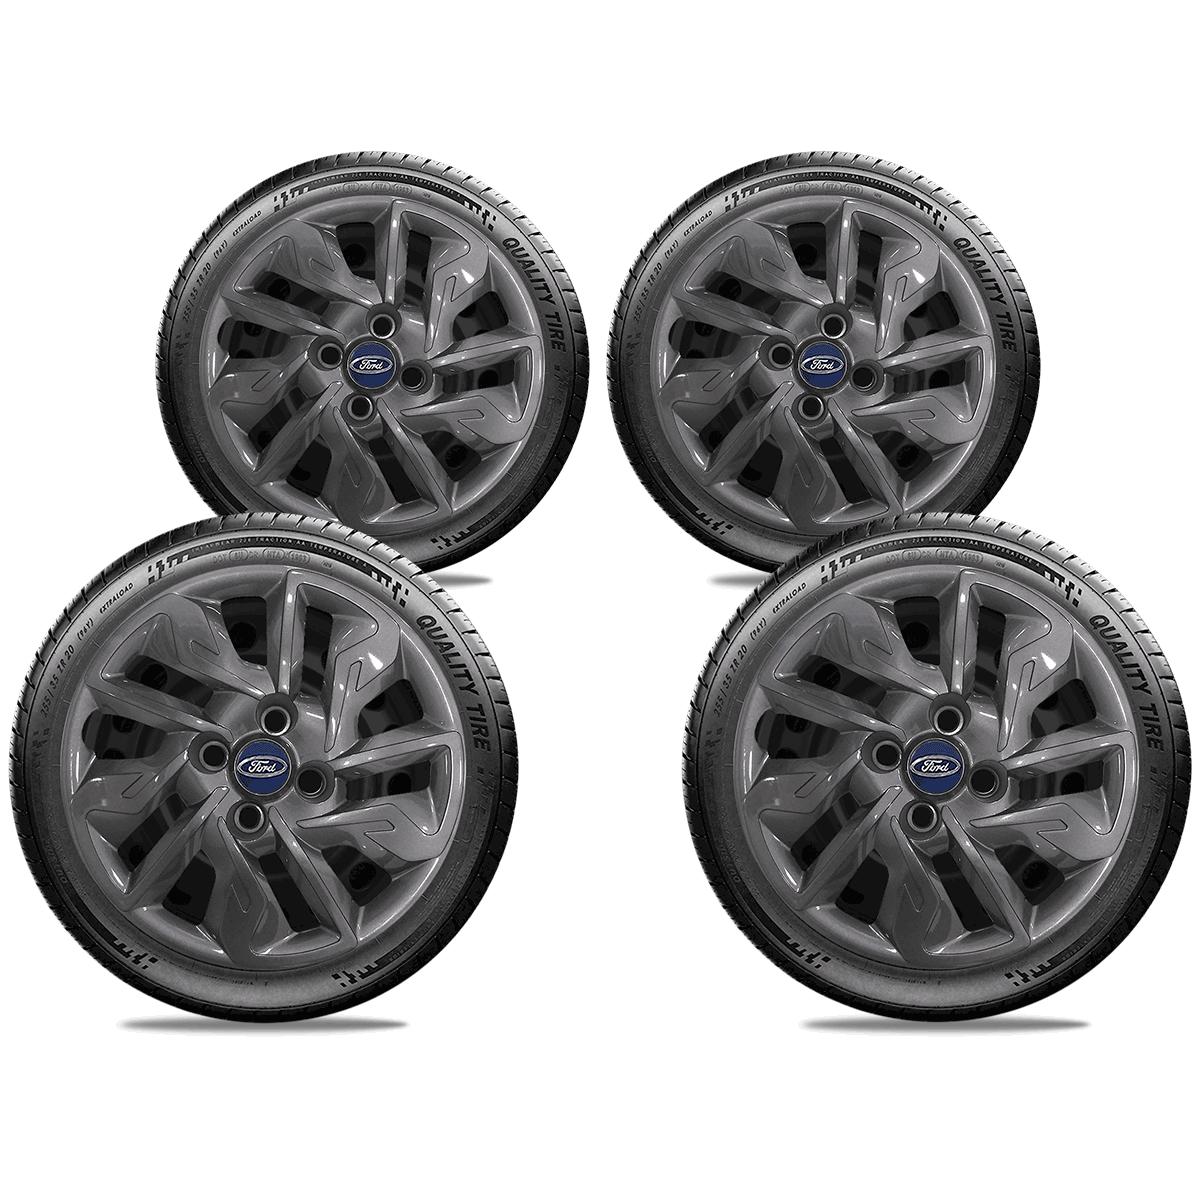 Calota Grafite Jogo 4Pçs Ford Novo Ka New Fiesta Aro 14 G292Gftj